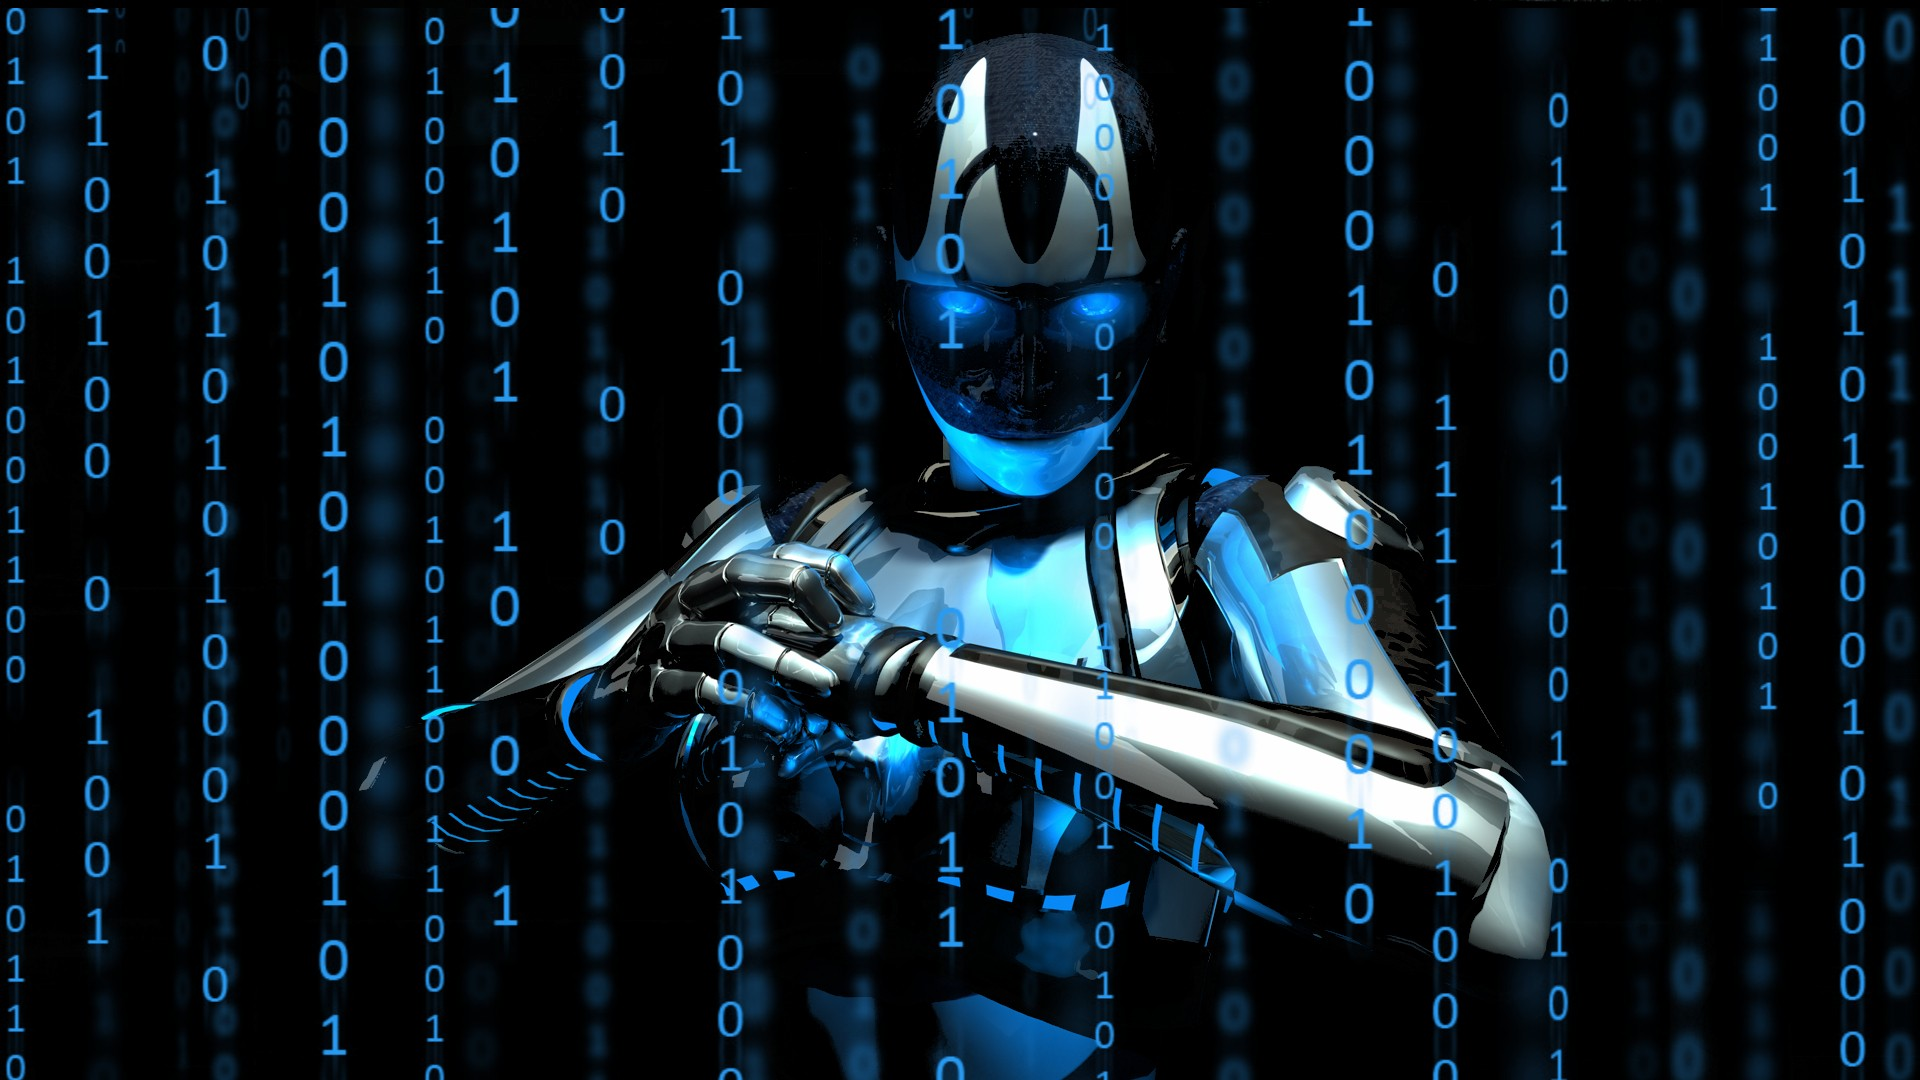 Robots Cyborgs Wallpaper 1920x1080 Robots Cyborgs Binary Machines 1920x1080